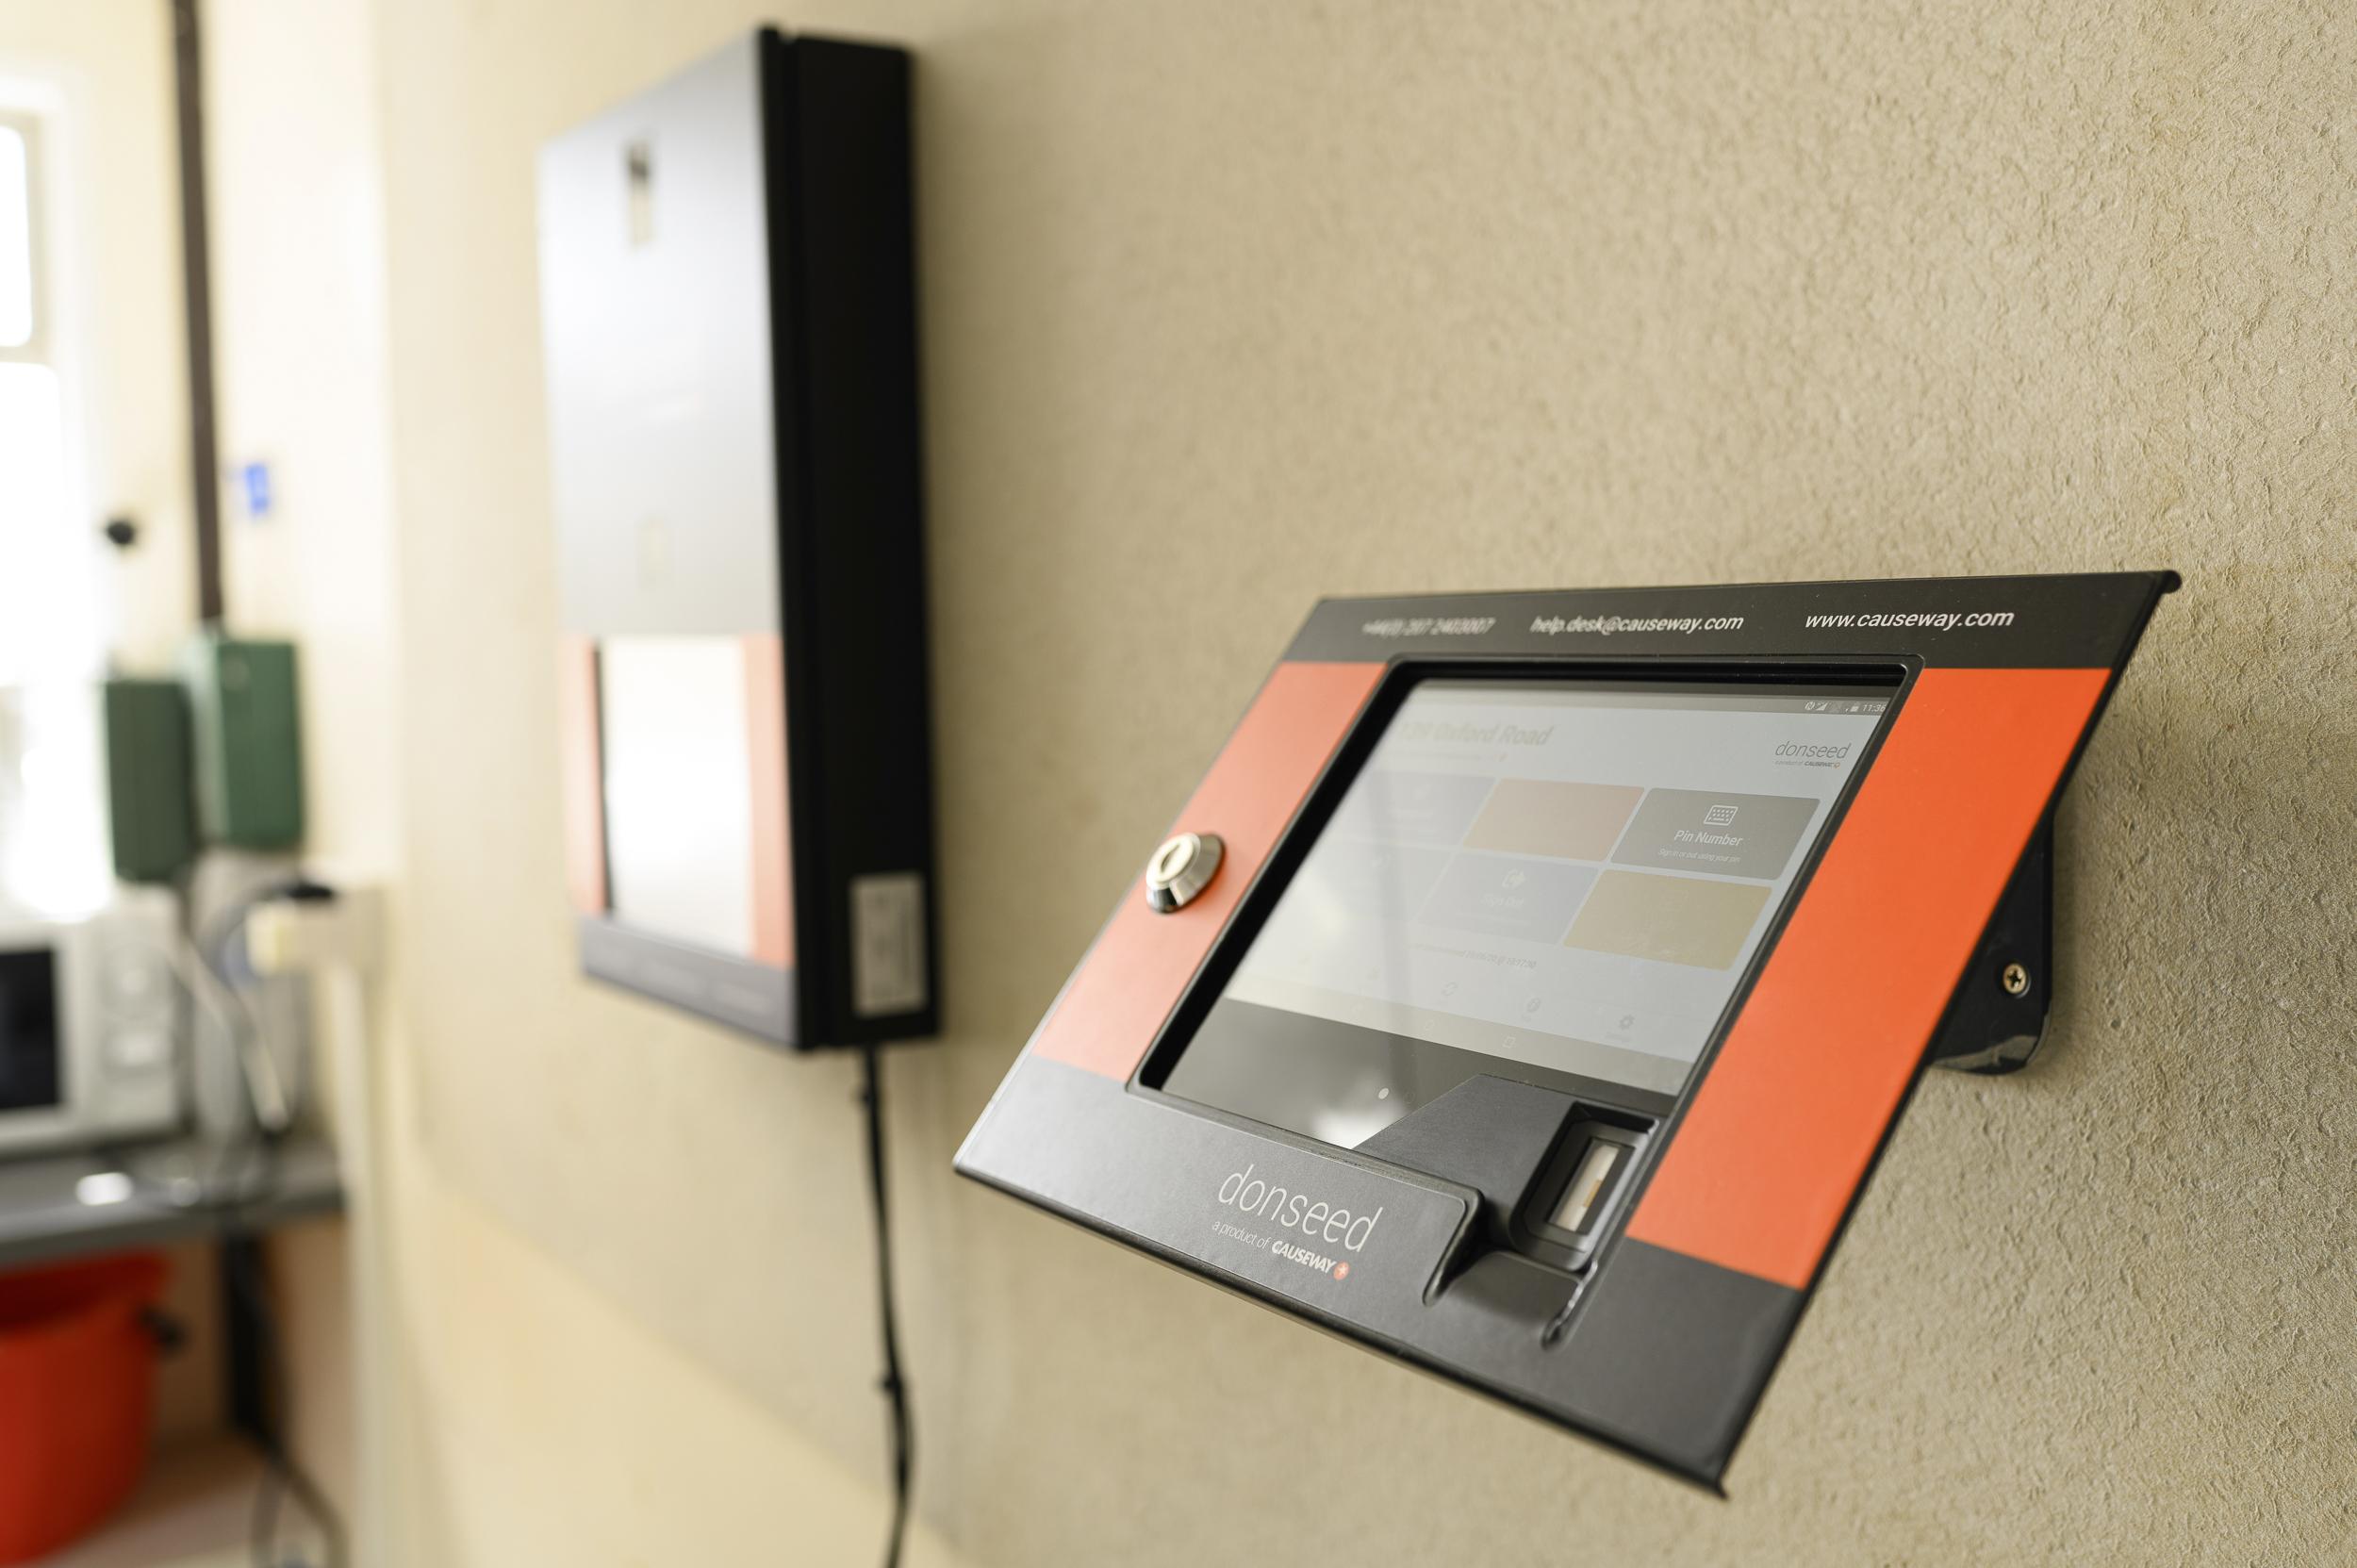 Causeway Donseed Biometric Tablet